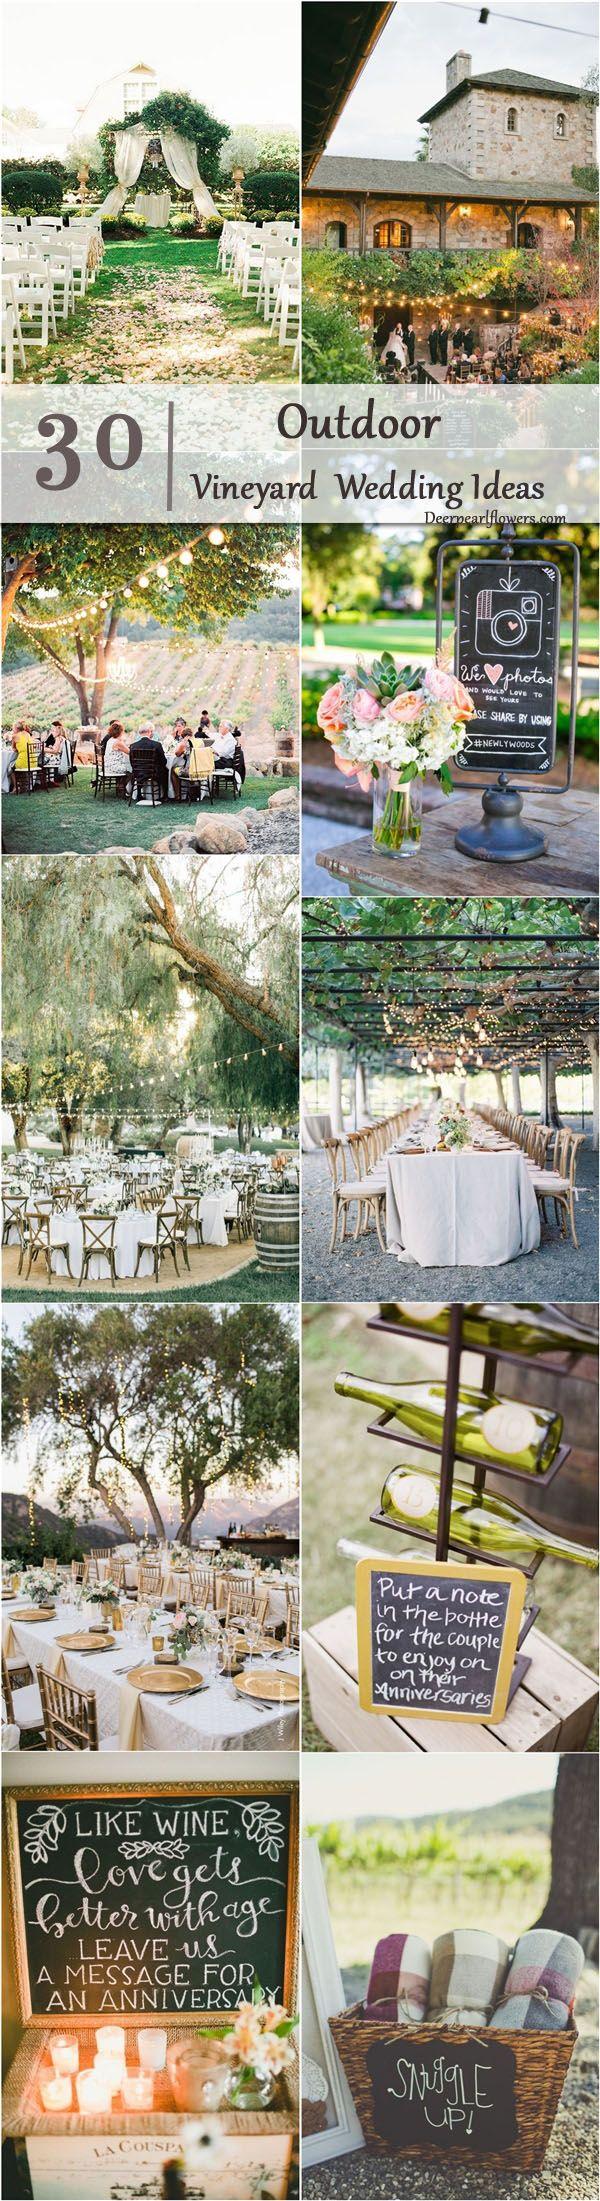 Vineyard Outdoor Wedding Decor Ideas / http://www.deerpearlflowers.com/outdoor-vineyard-wedding-ideas/